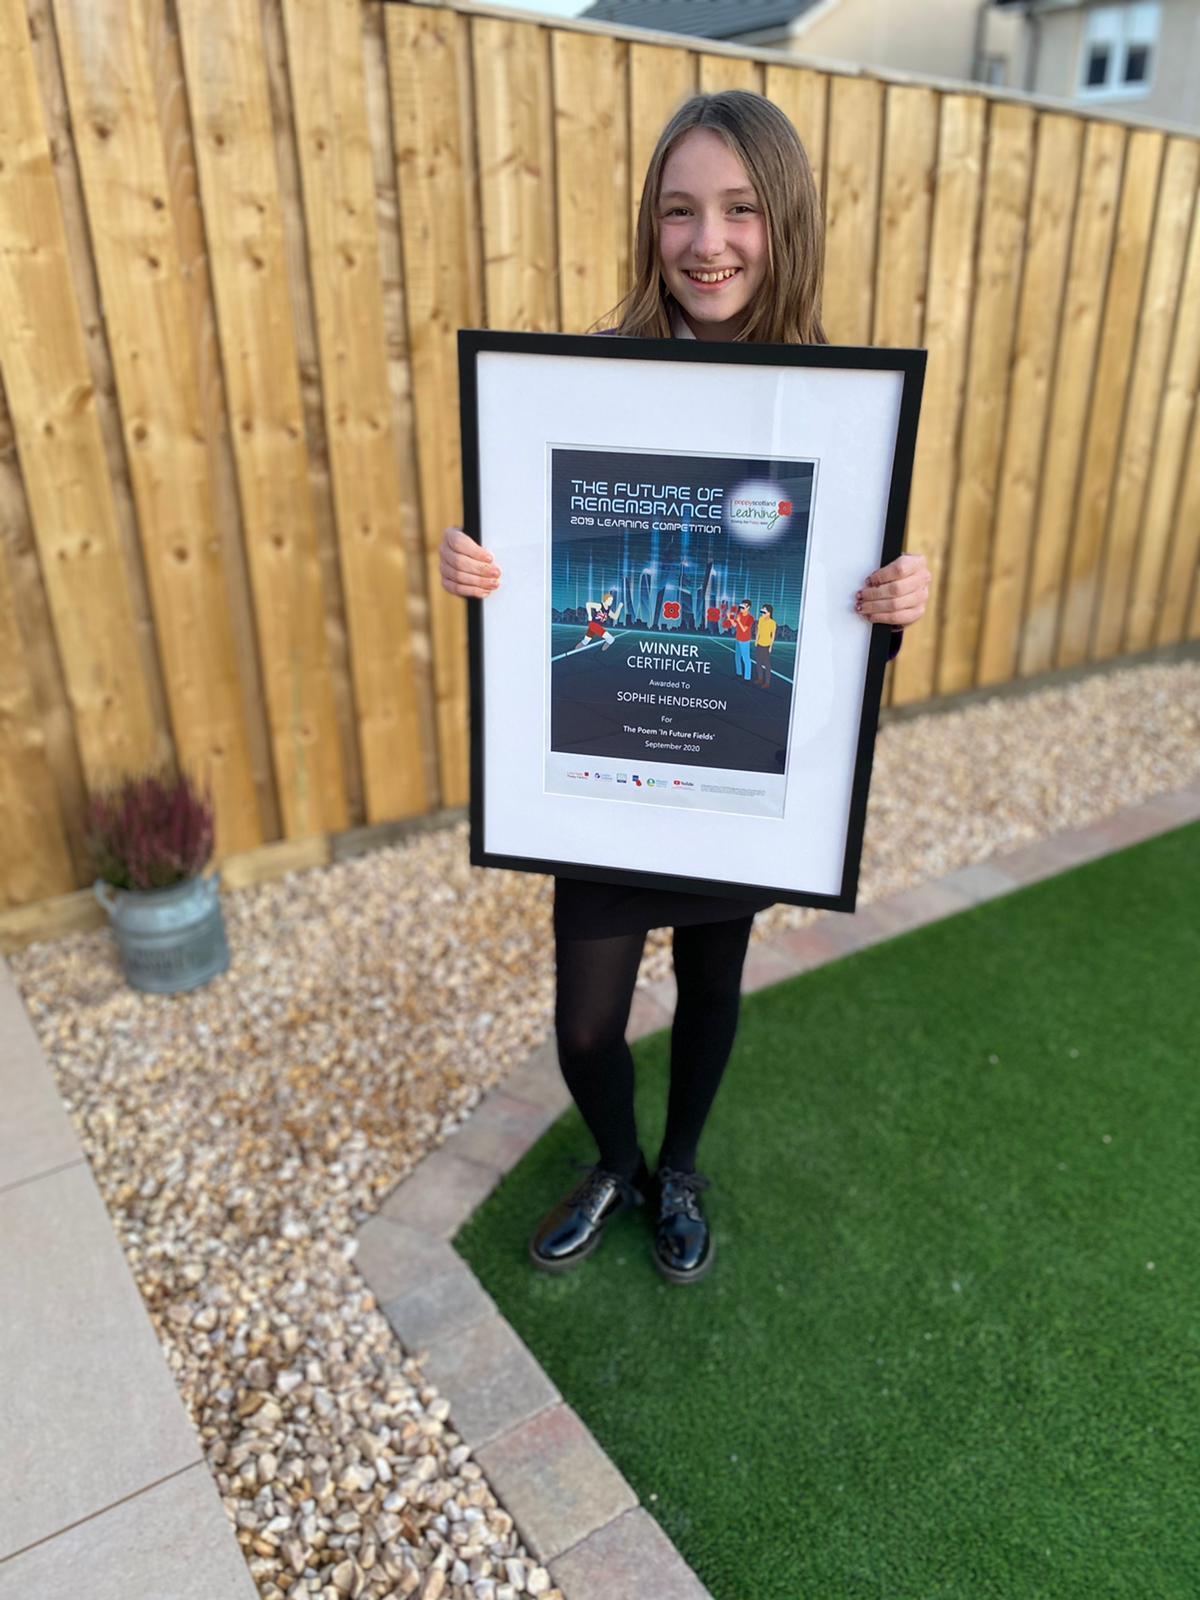 Sophie-Henderson-with-certificate-in-garden